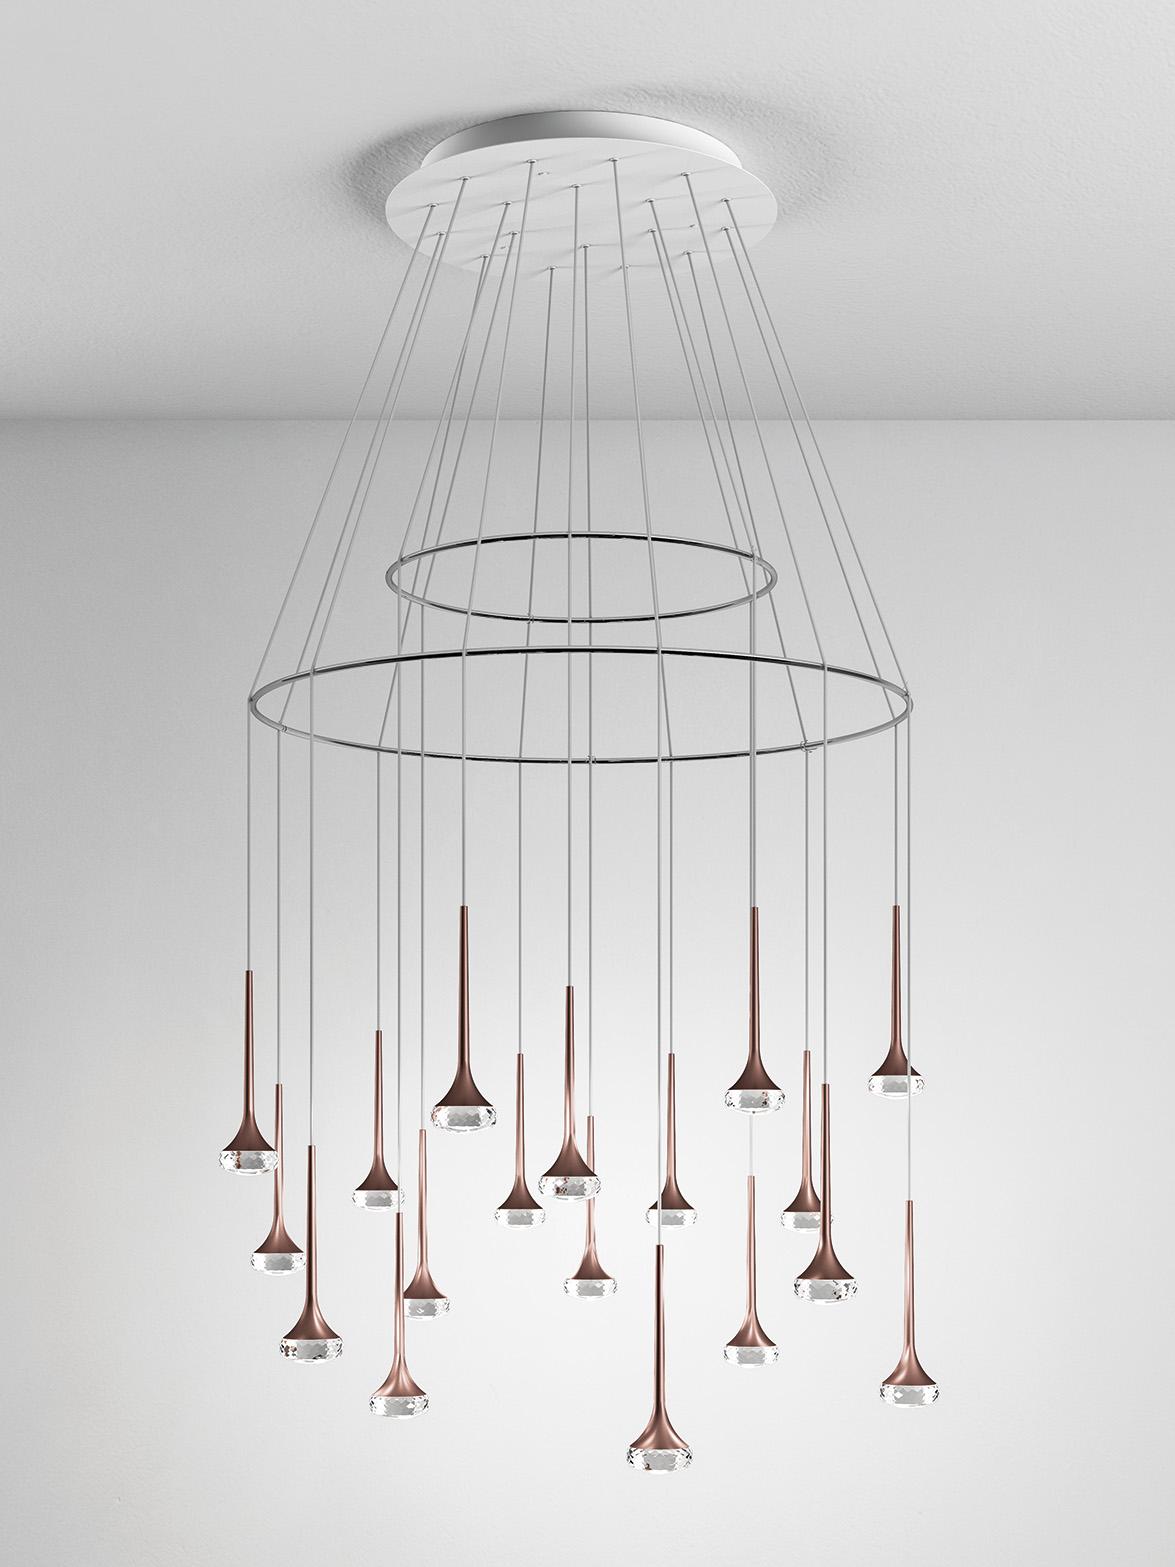 Fairy by Manuel Vivian for Axo Light, magical drops of light